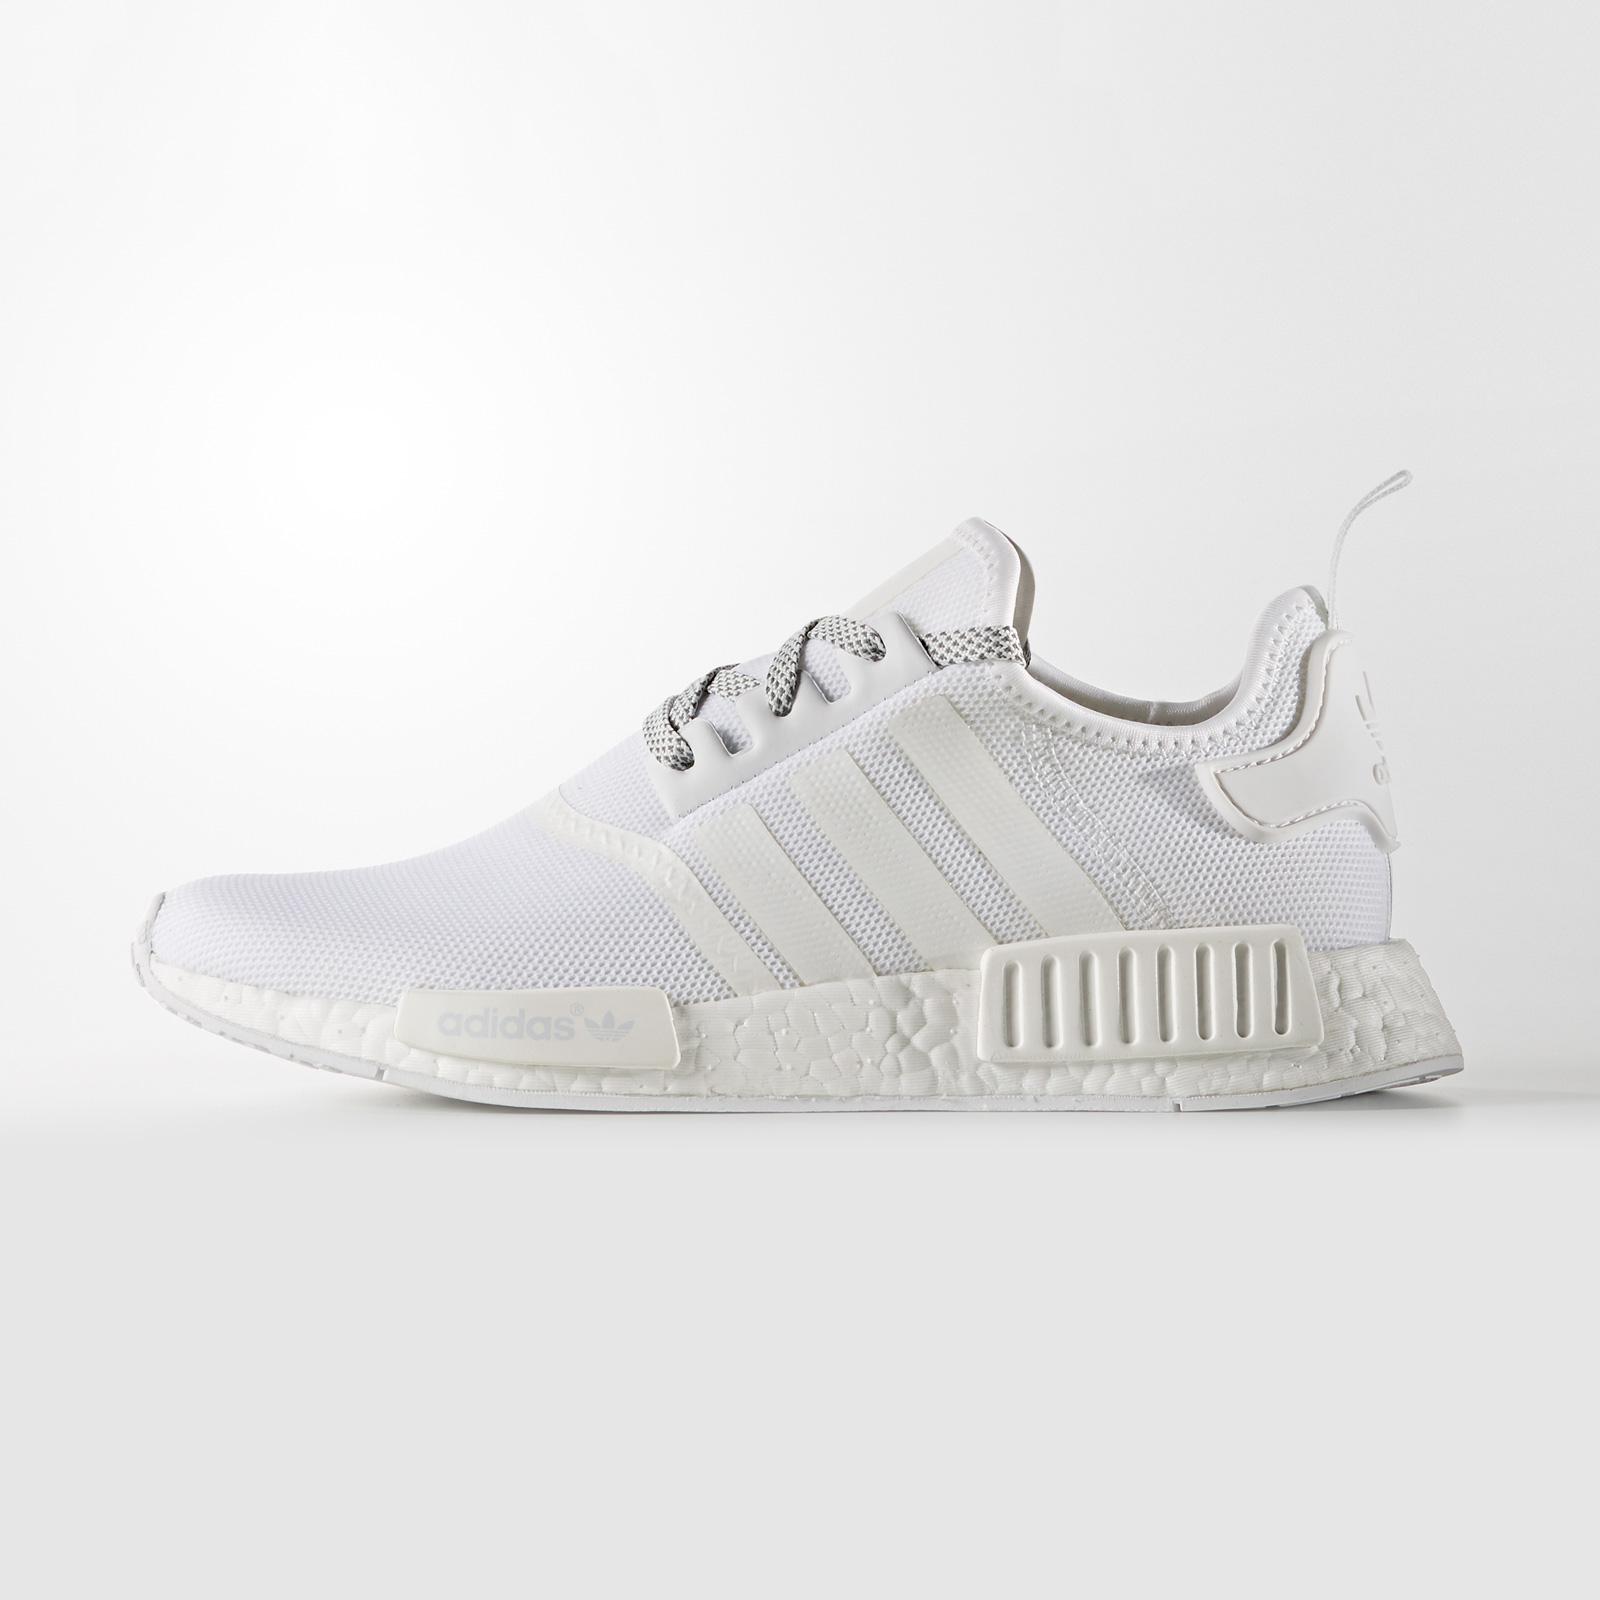 adidas NMD_R1 - S31506 - Sneakersnstuff